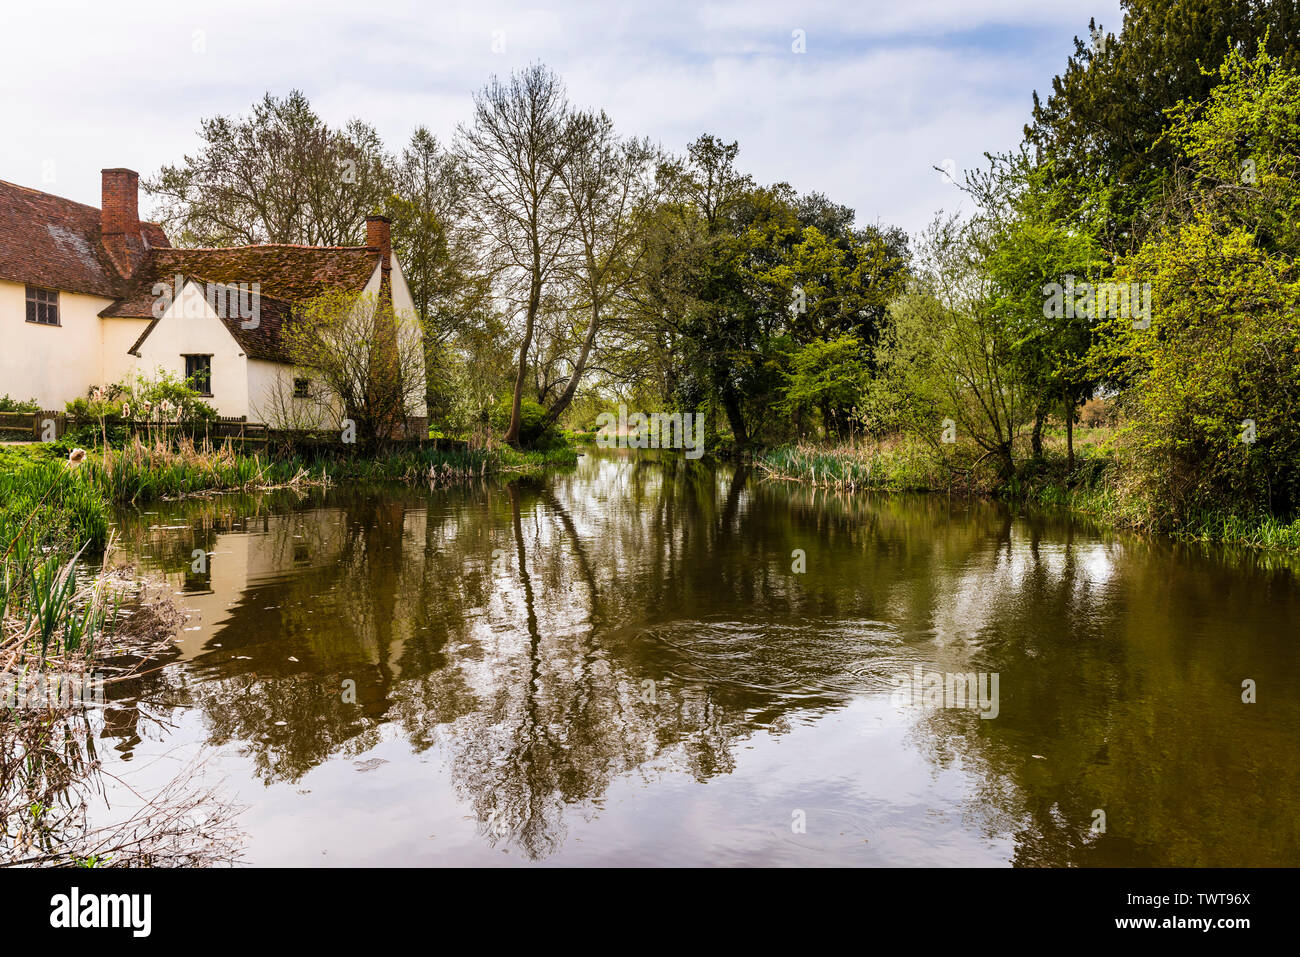 Facsimile of The Hay Wain at Flatford Mill, Suffolk, UK - Stock Image